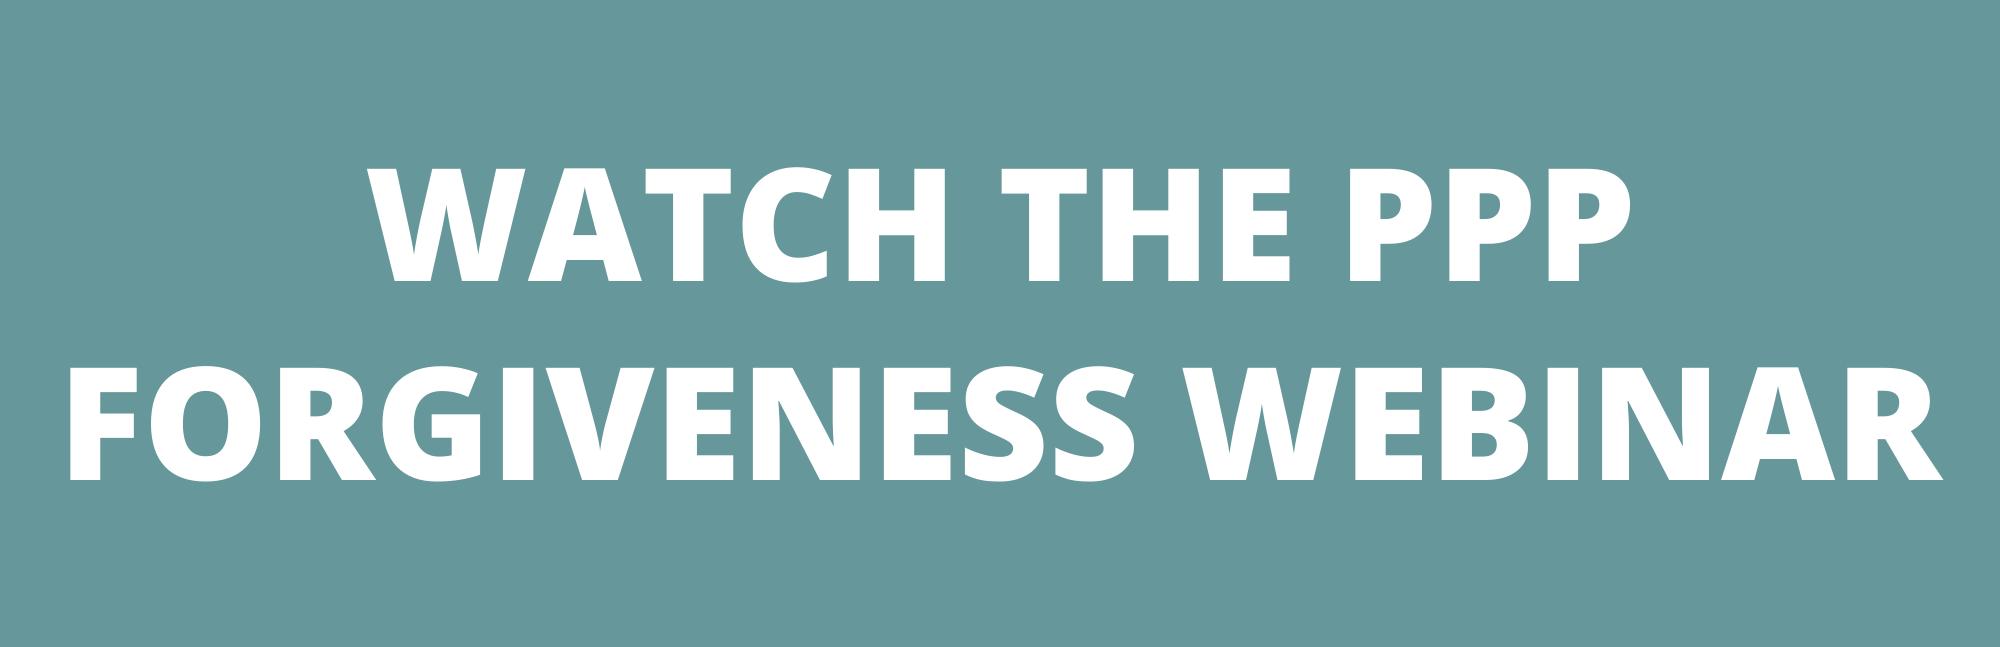 Watch the PPP Forgiveness Webinar